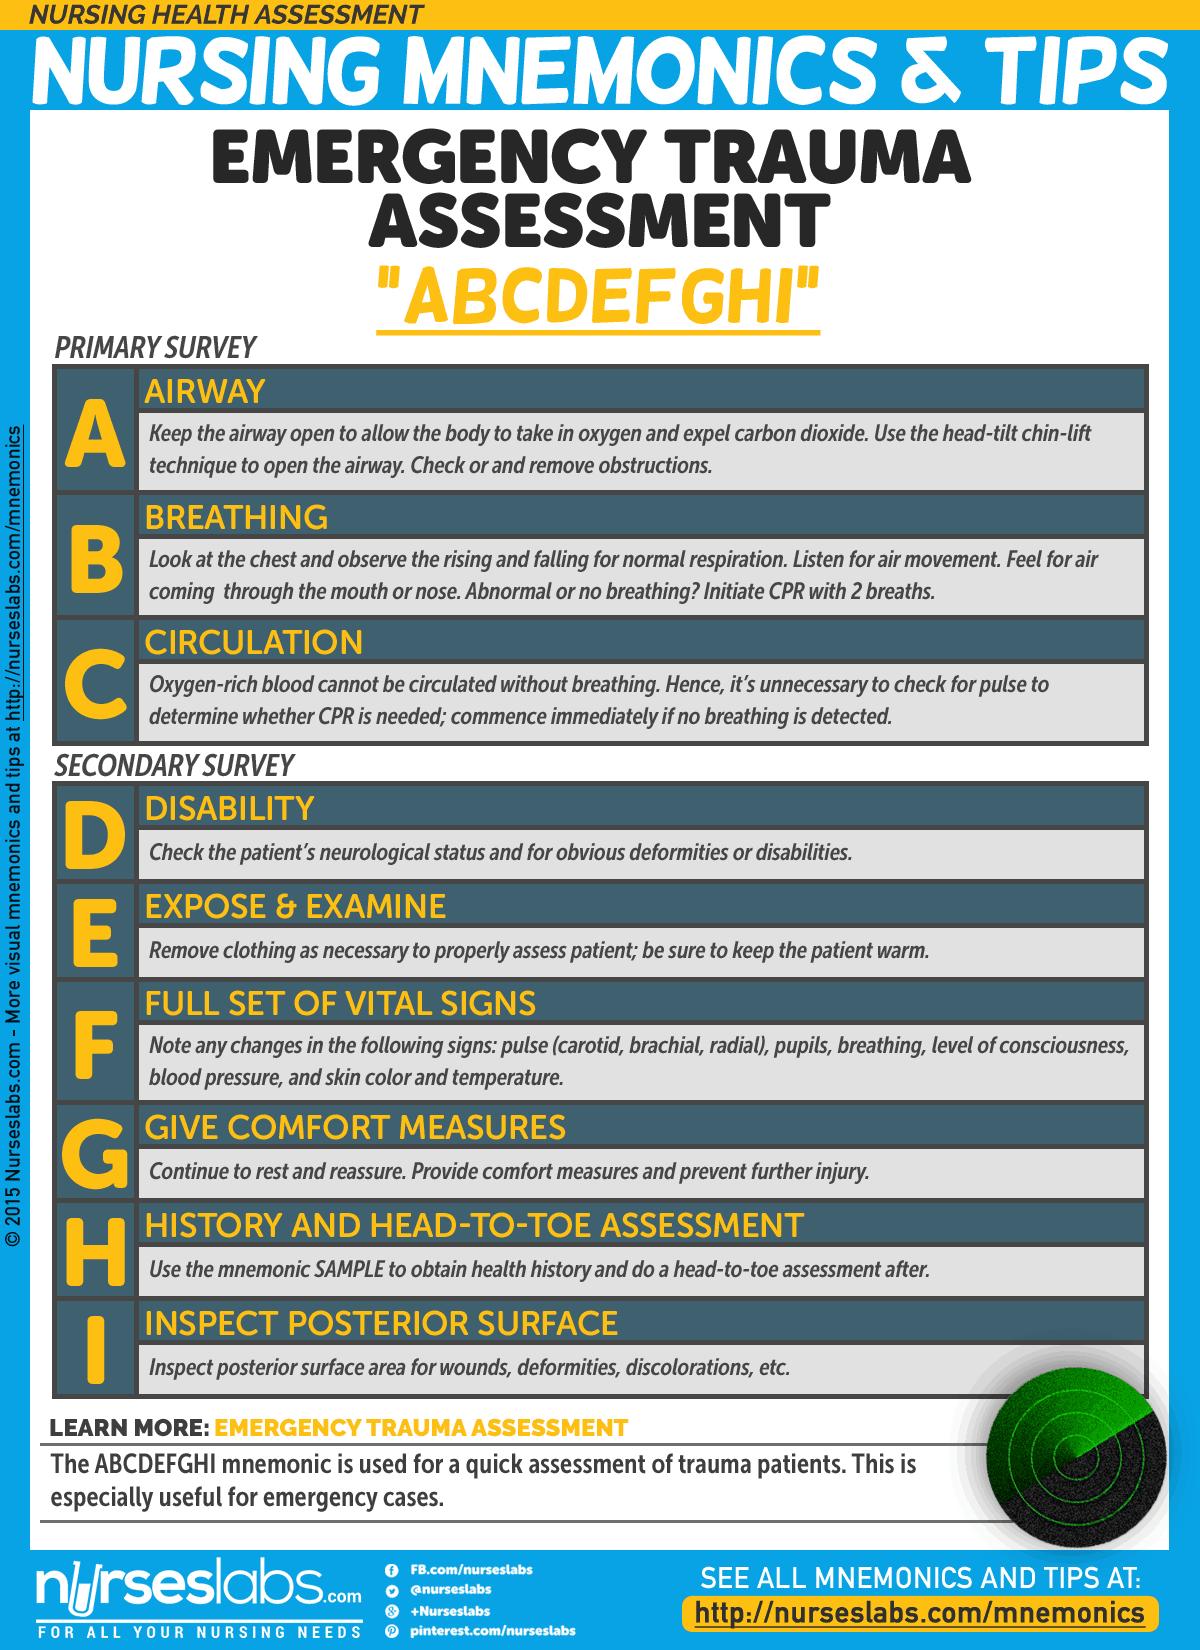 NHA-005: Emergency Trauma Assessment (ABCDEFGHI) Nursing